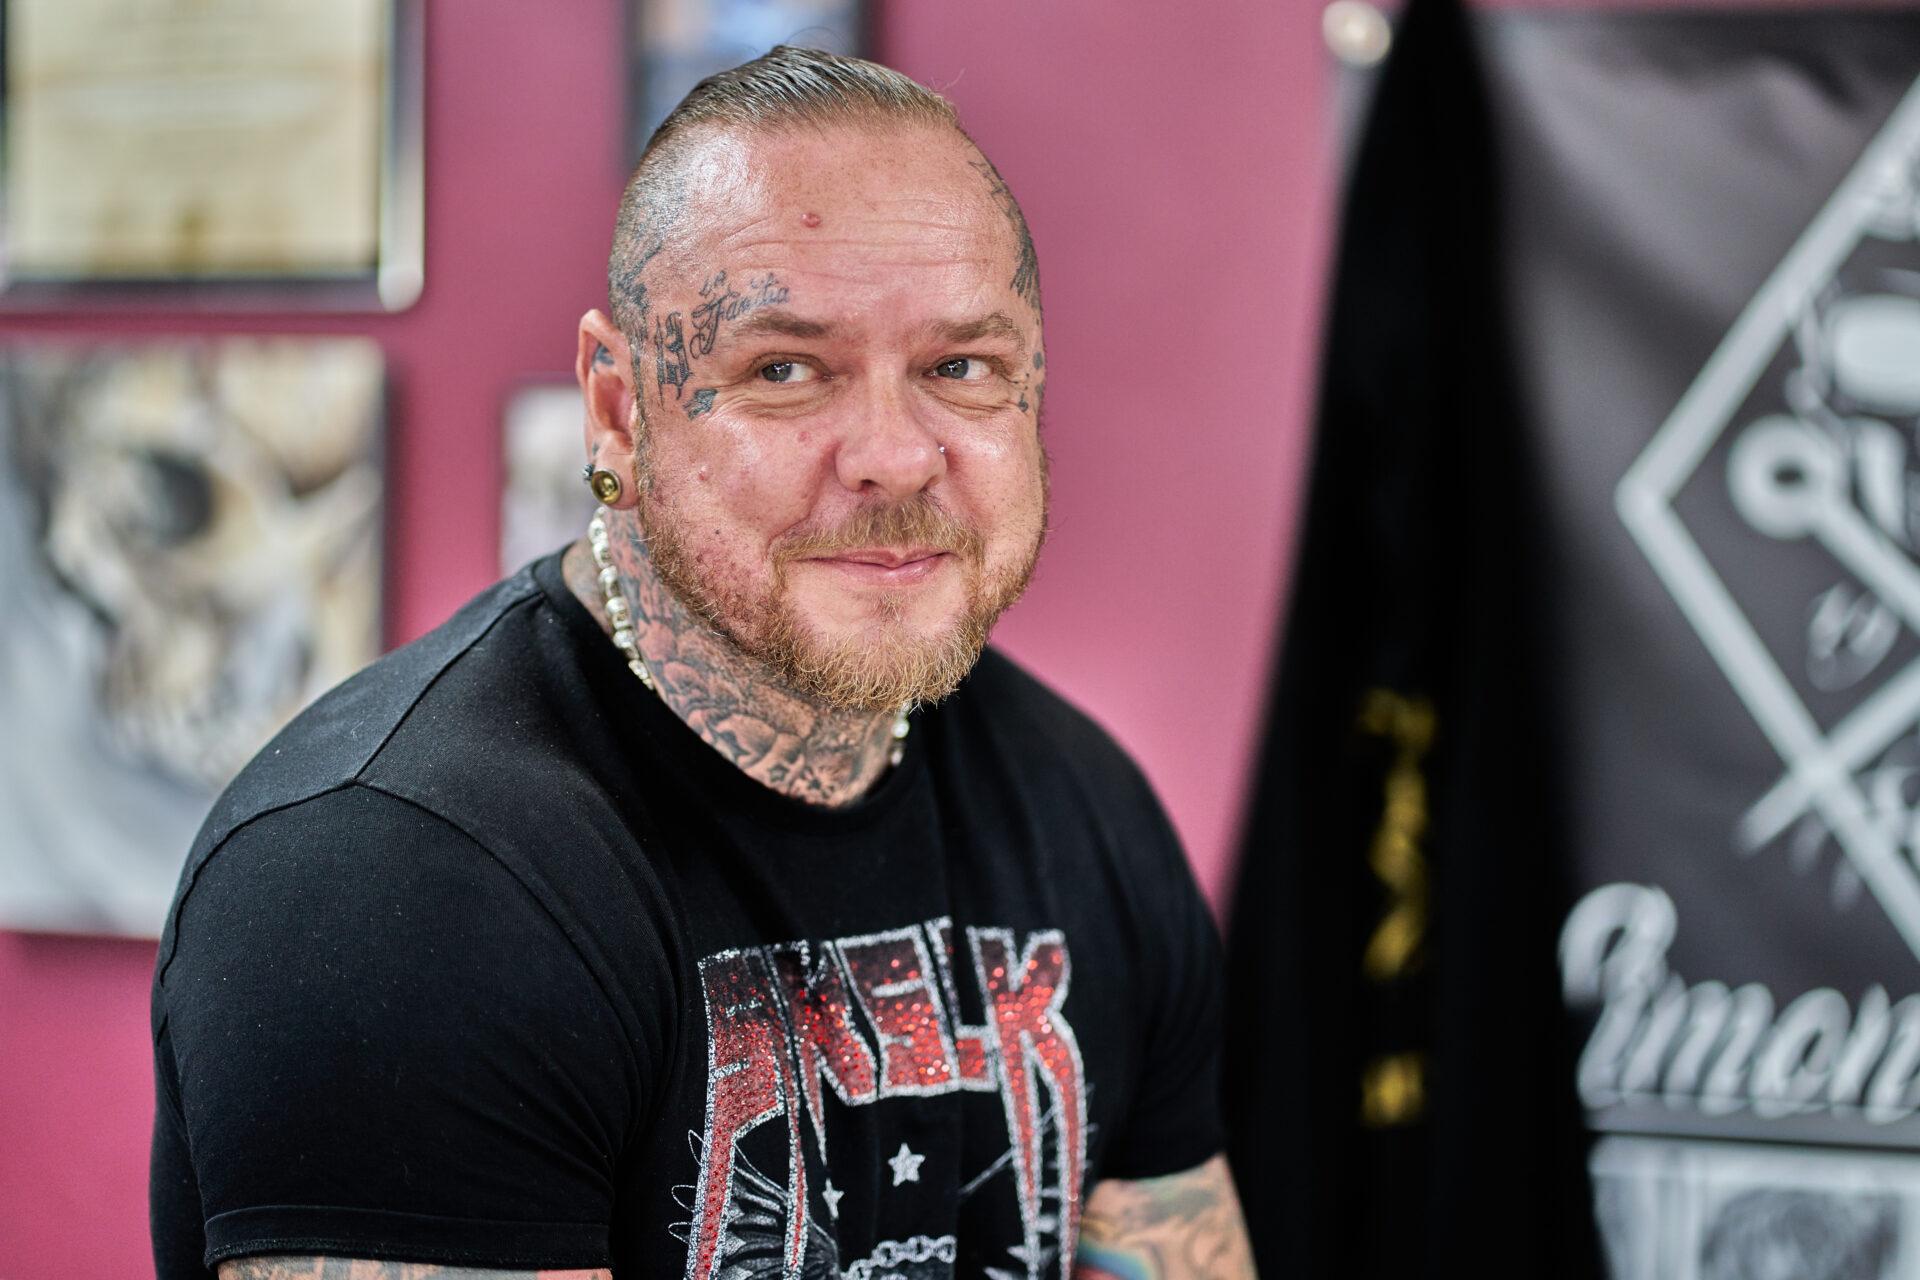 Simon Syder Norwich tattooist